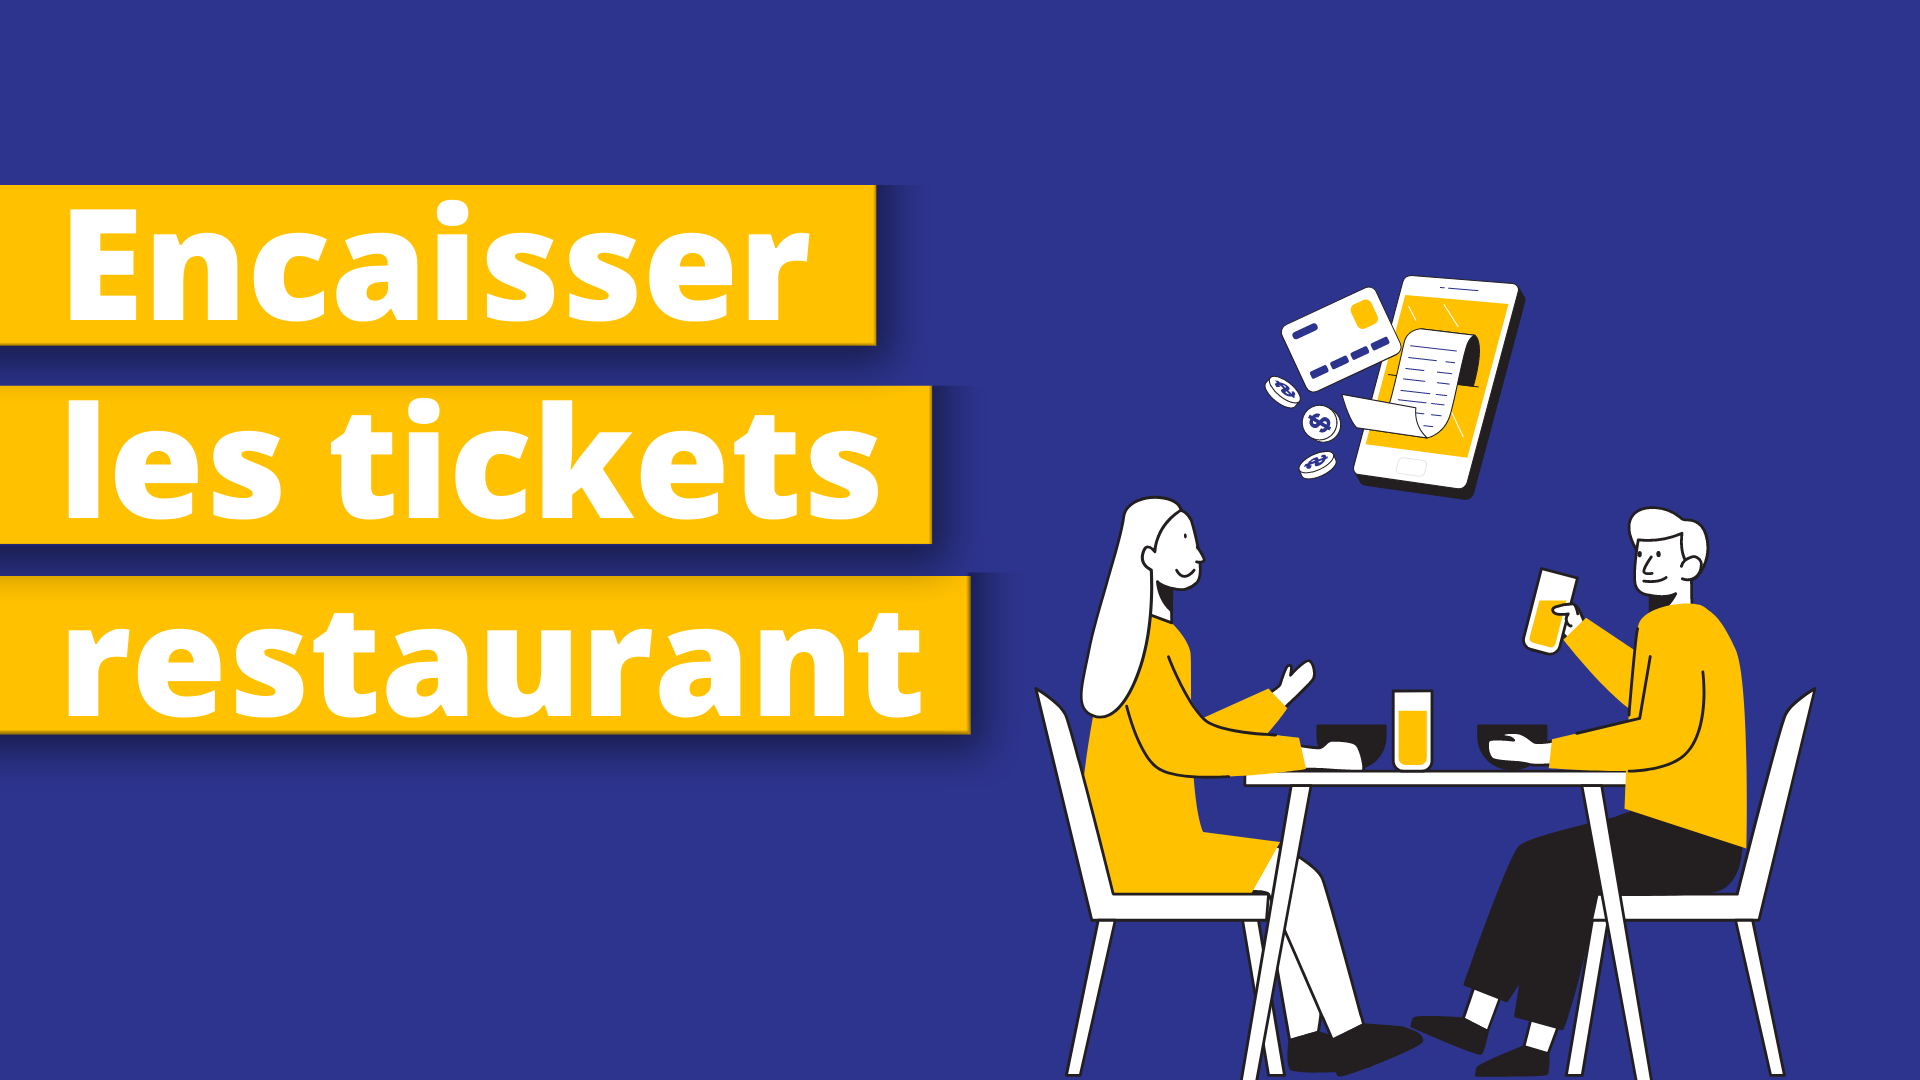 Encaisser tickets restaurant